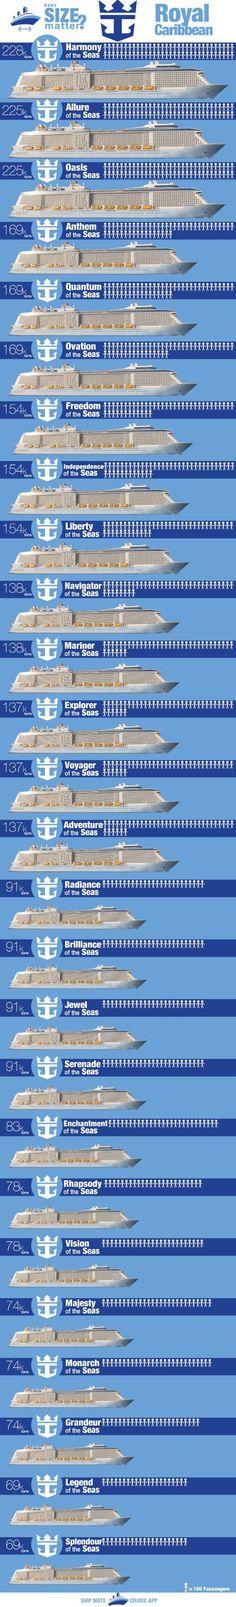 Royal Caribbean Ships by Size Infograph #cruisetipsroyalcaribbean